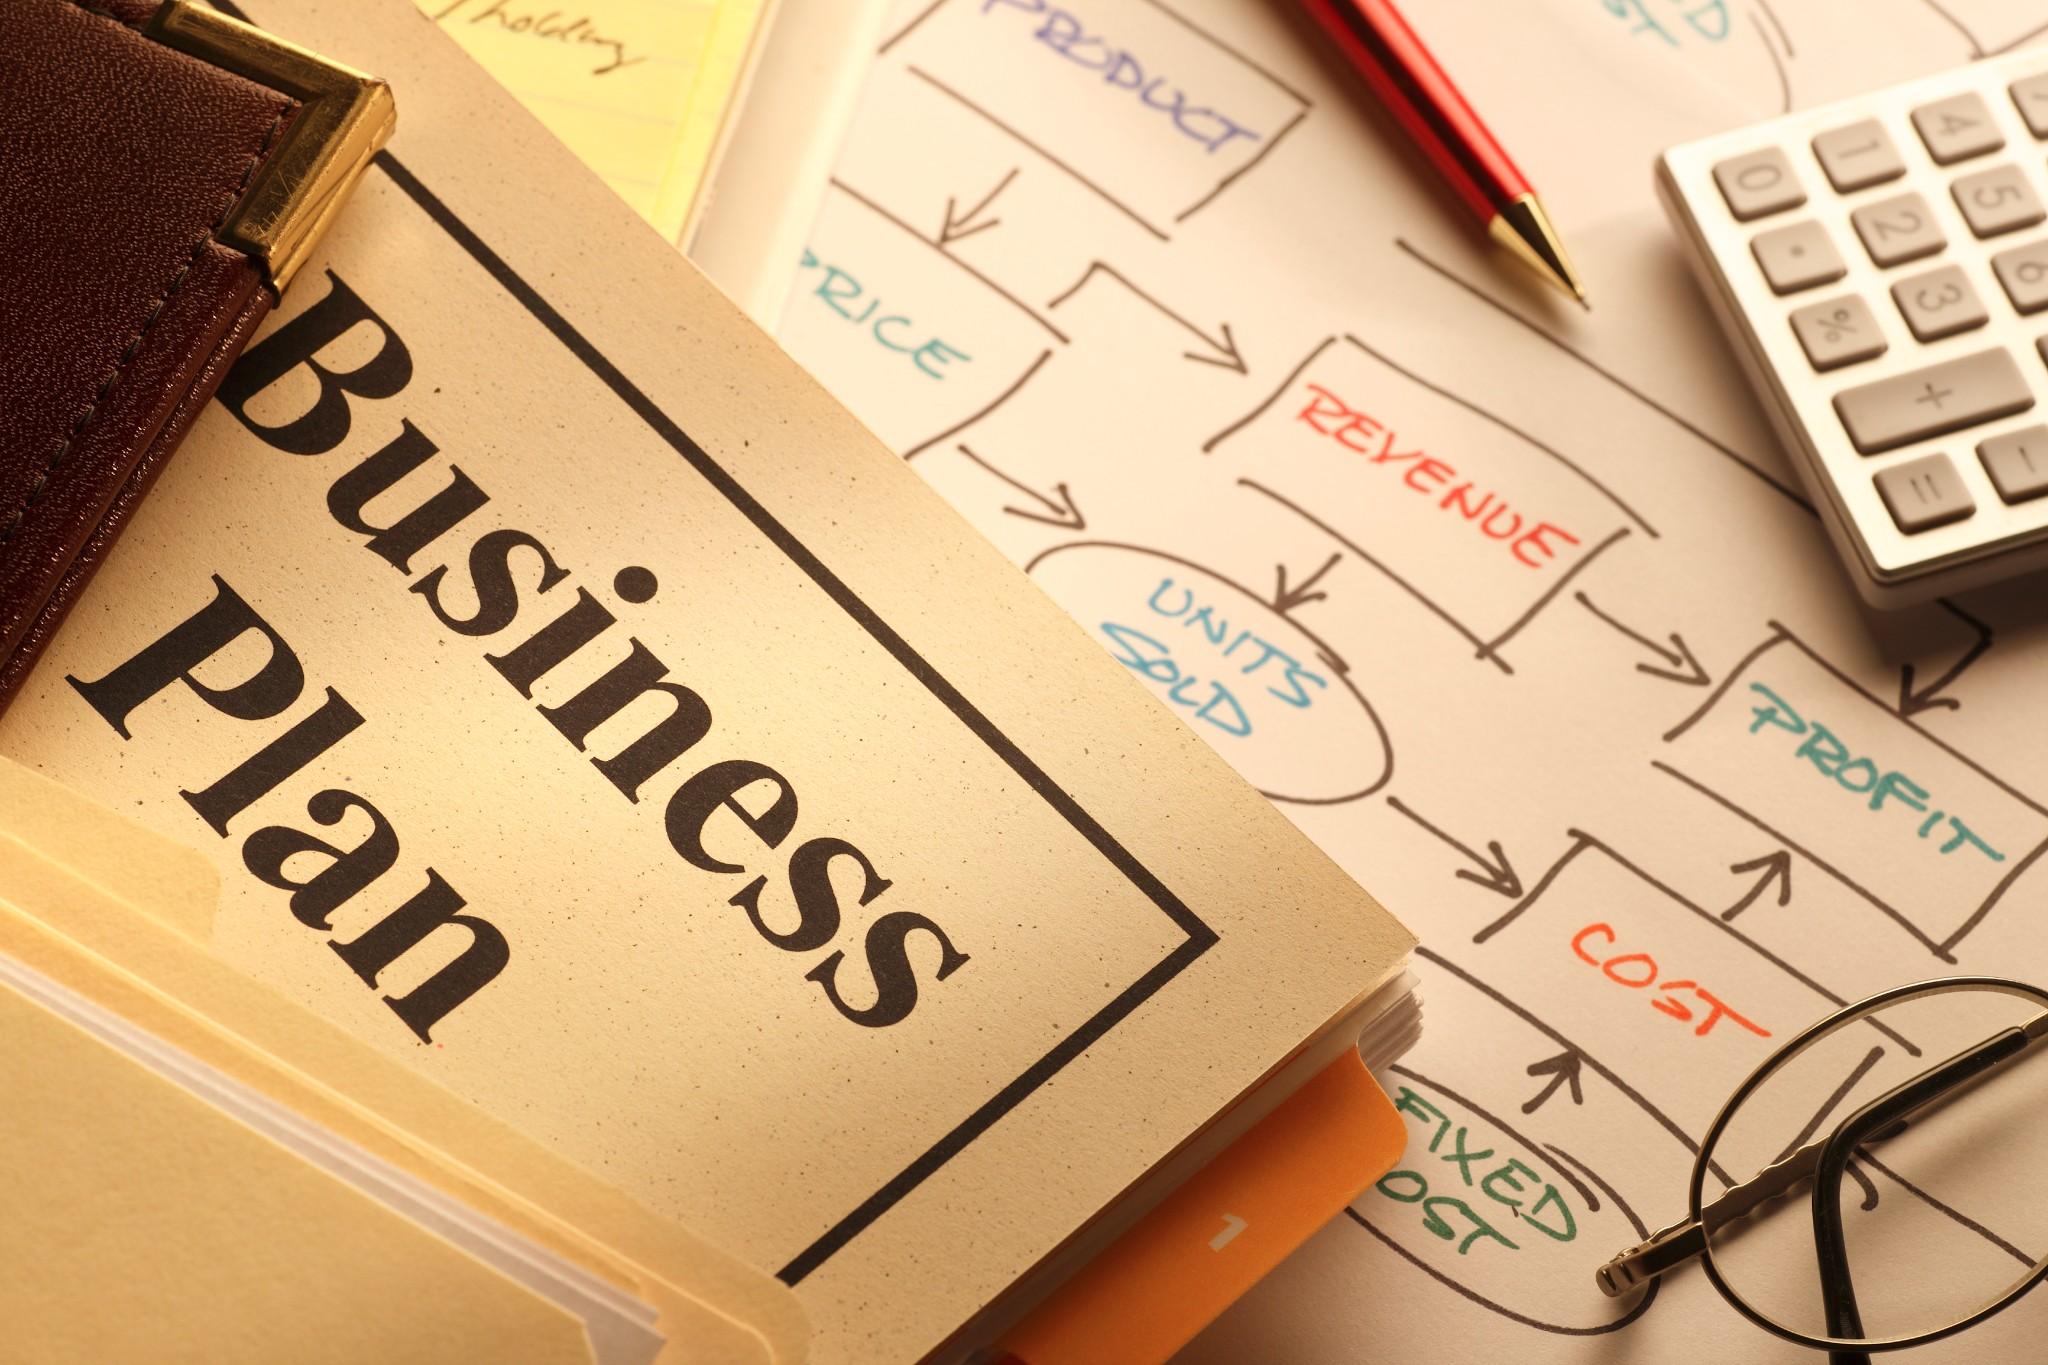 Грамотные бизнес-планы